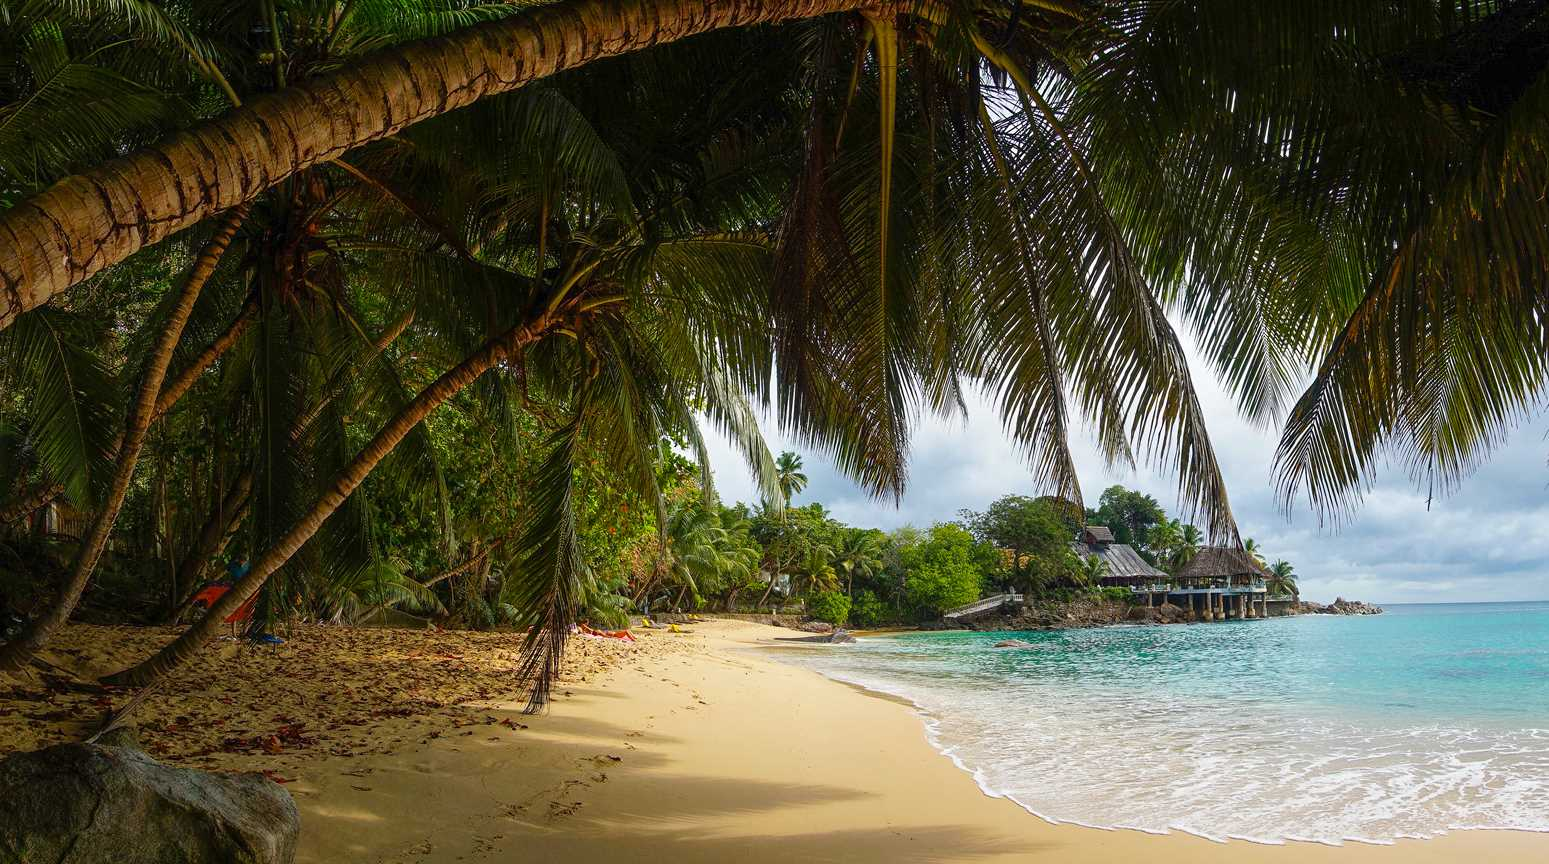 Sunset beach, Mahe island, Seychelles